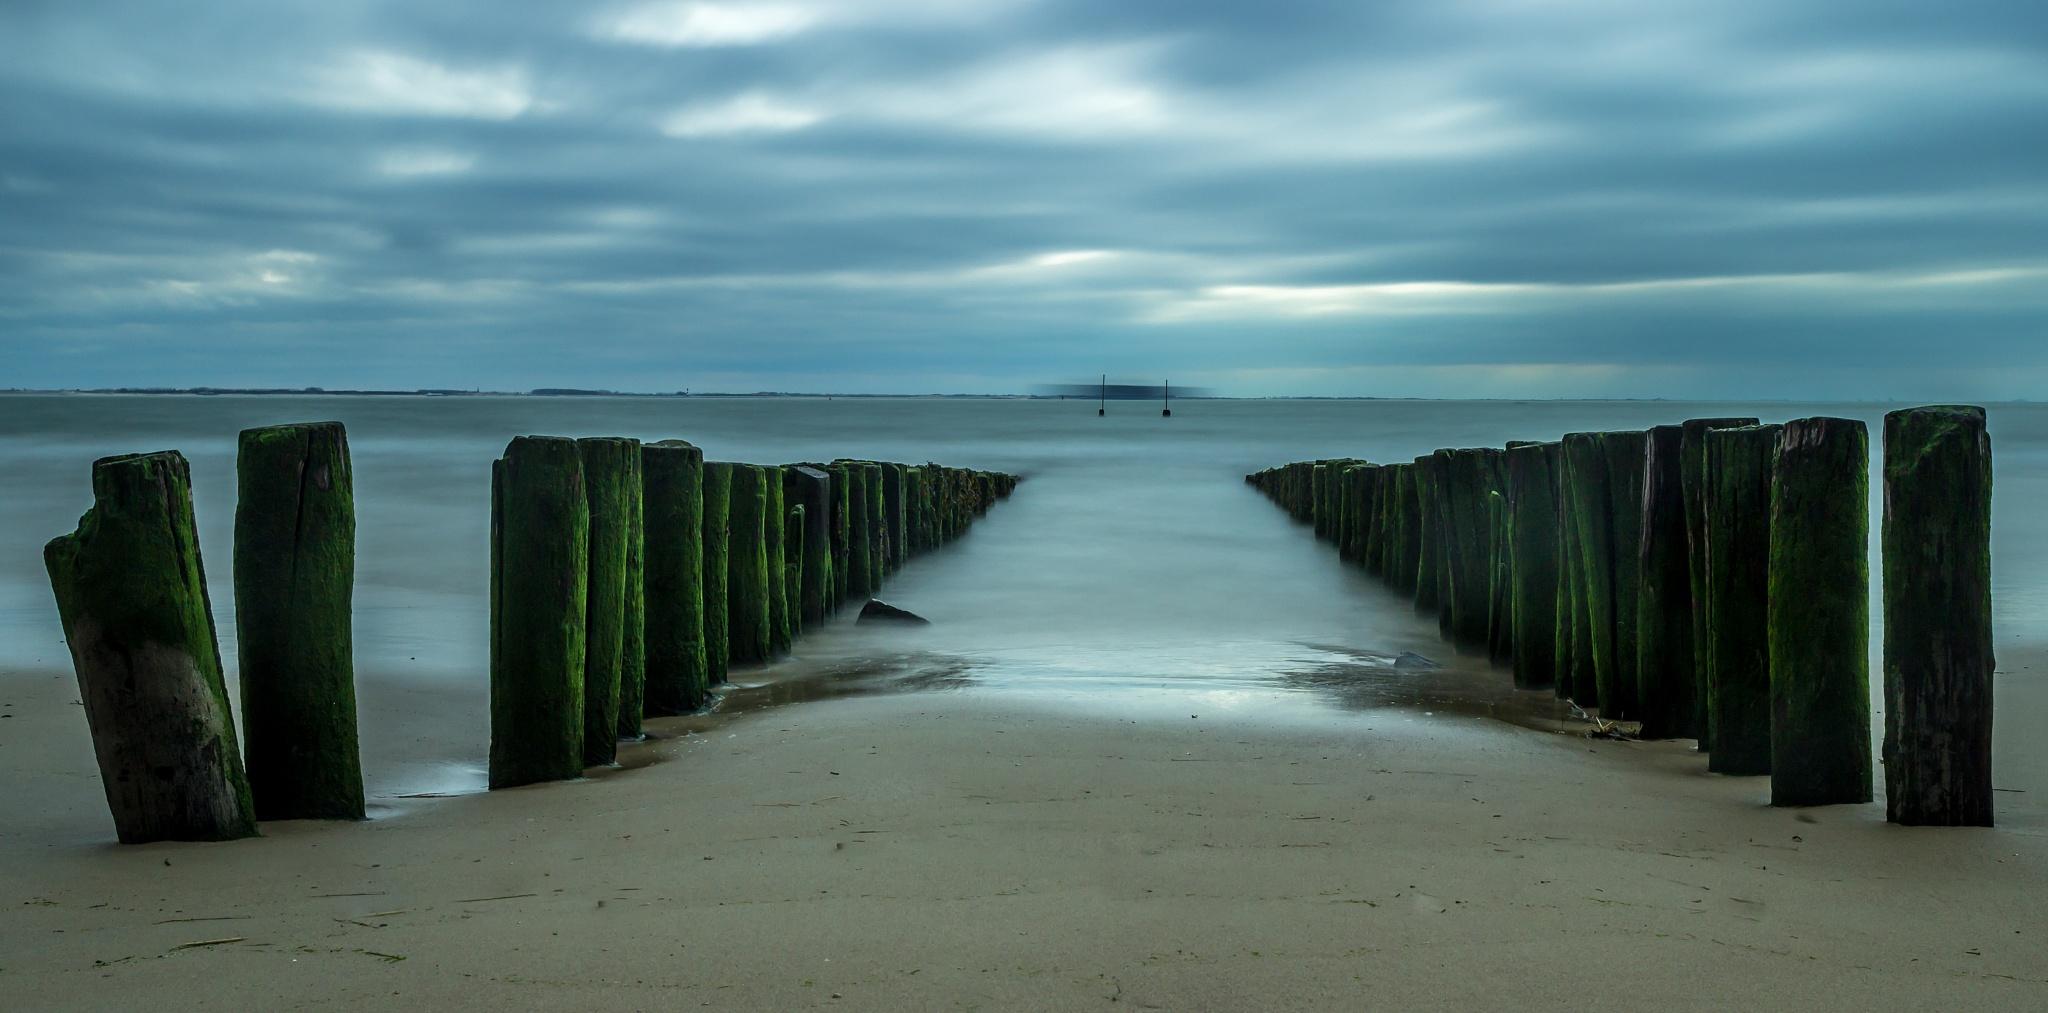 Cloud and sea at Scheveningen by dieter lagatie